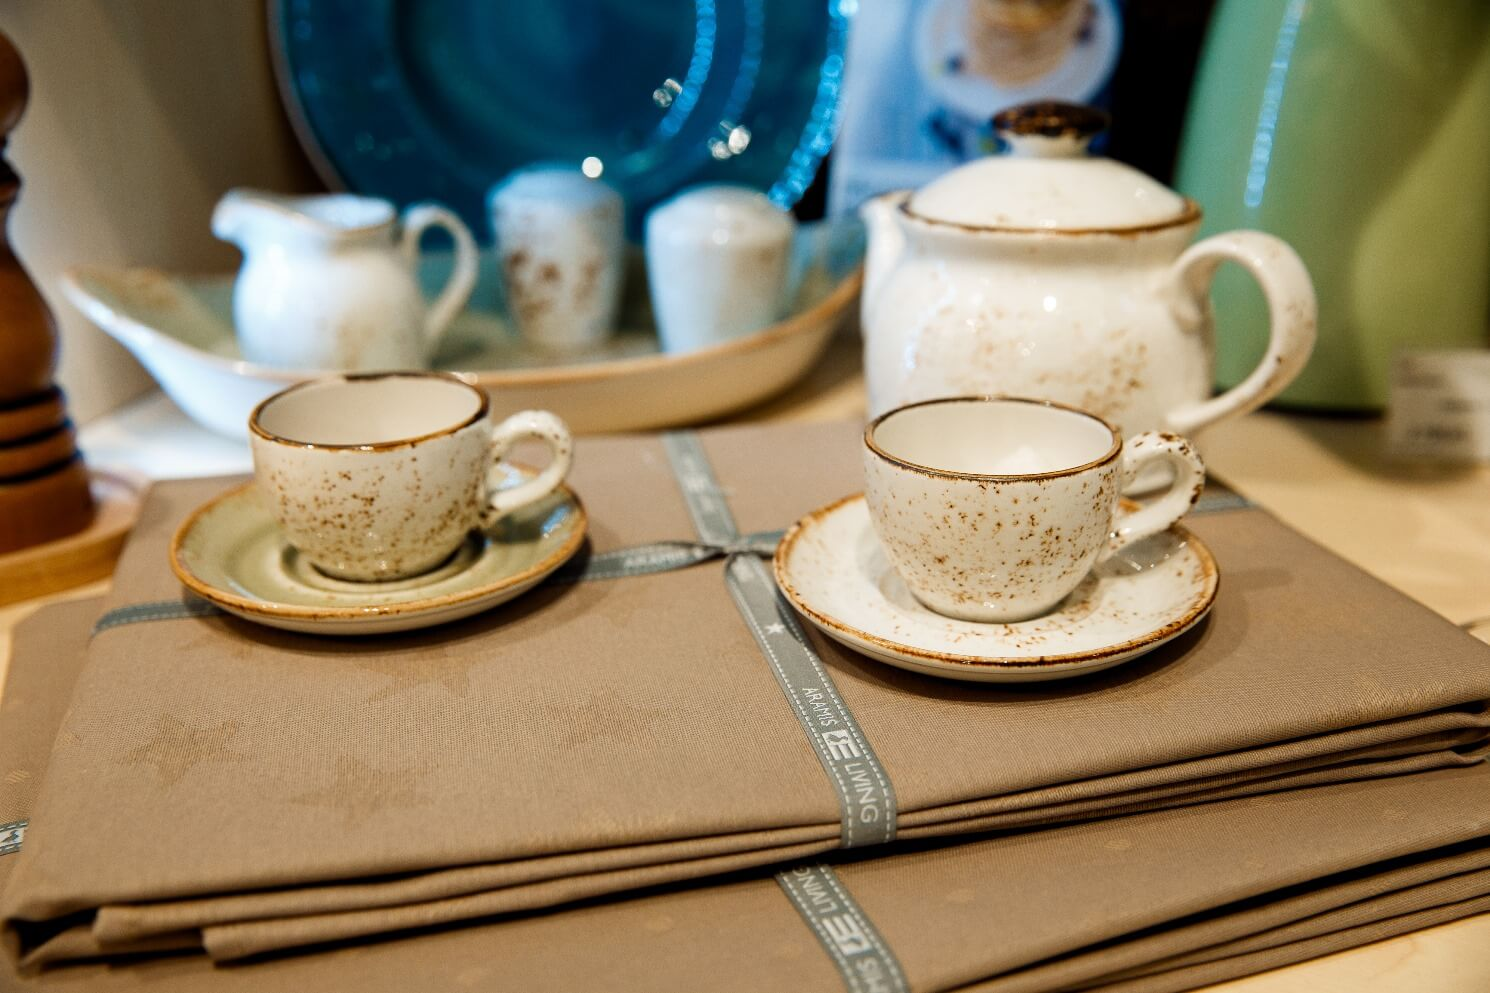 Чайник с крышкой Steelite CRAFT WHITE, объем 0,425 л, белый Steelite 11550367 фото 2